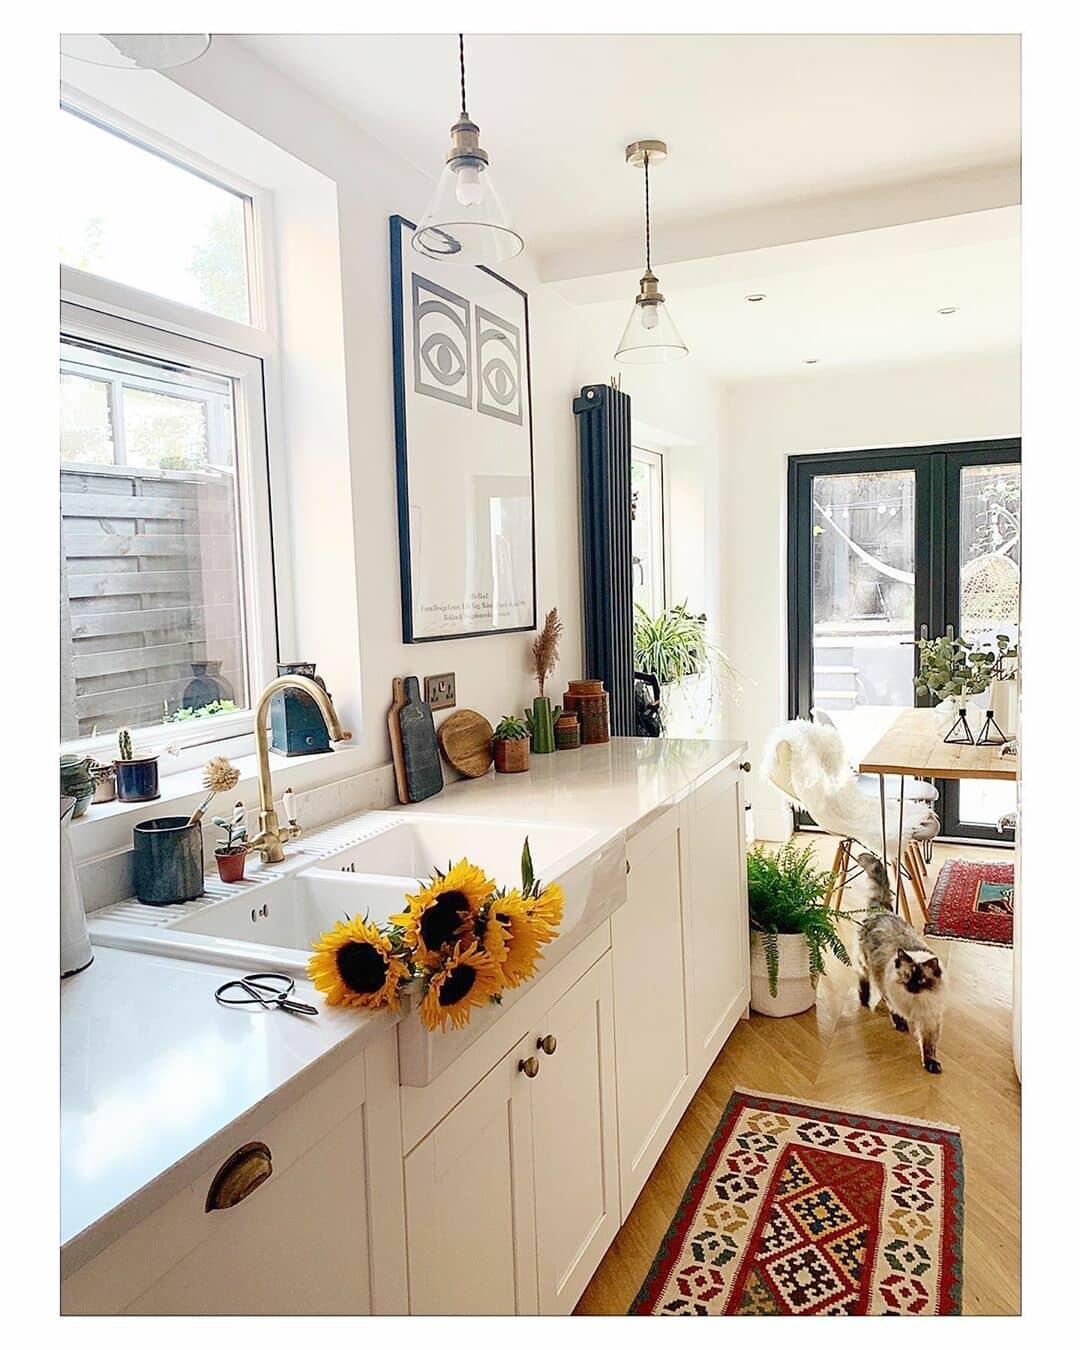 vertical Milano Windsor radiator in a white kitchen